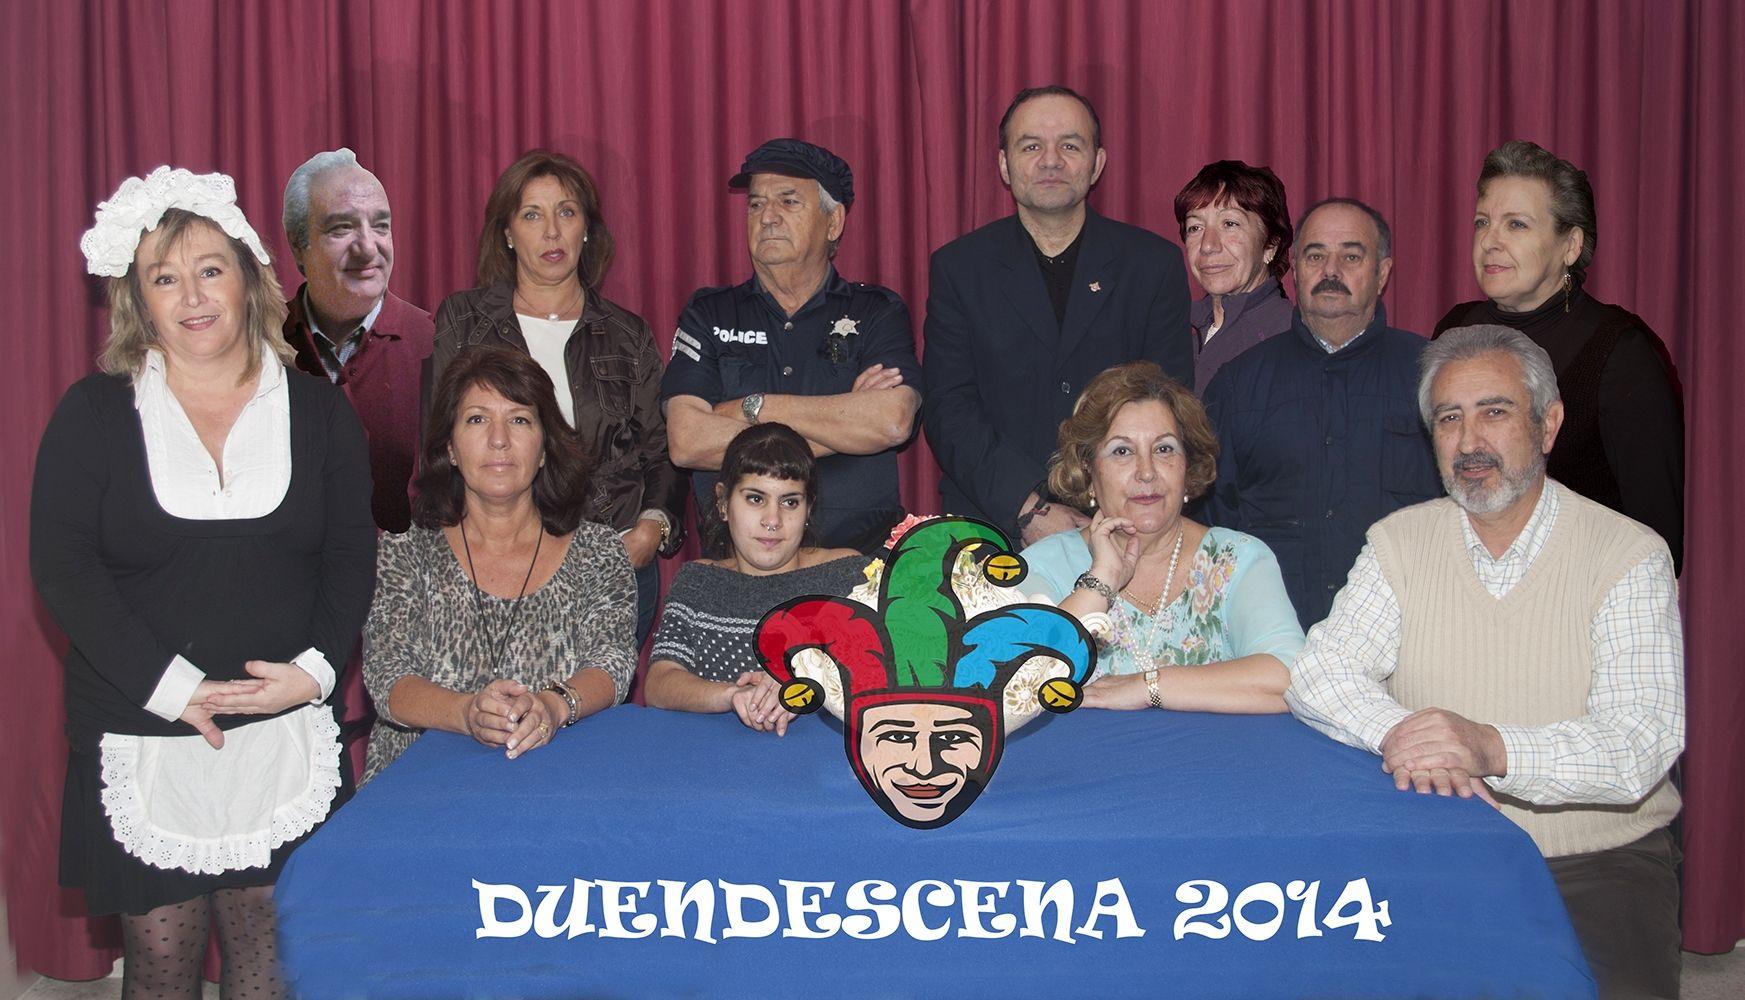 XXII Muestra de Teatro de Centros Docentes: Asociación Cultural Duendescena 'Breve-rías'